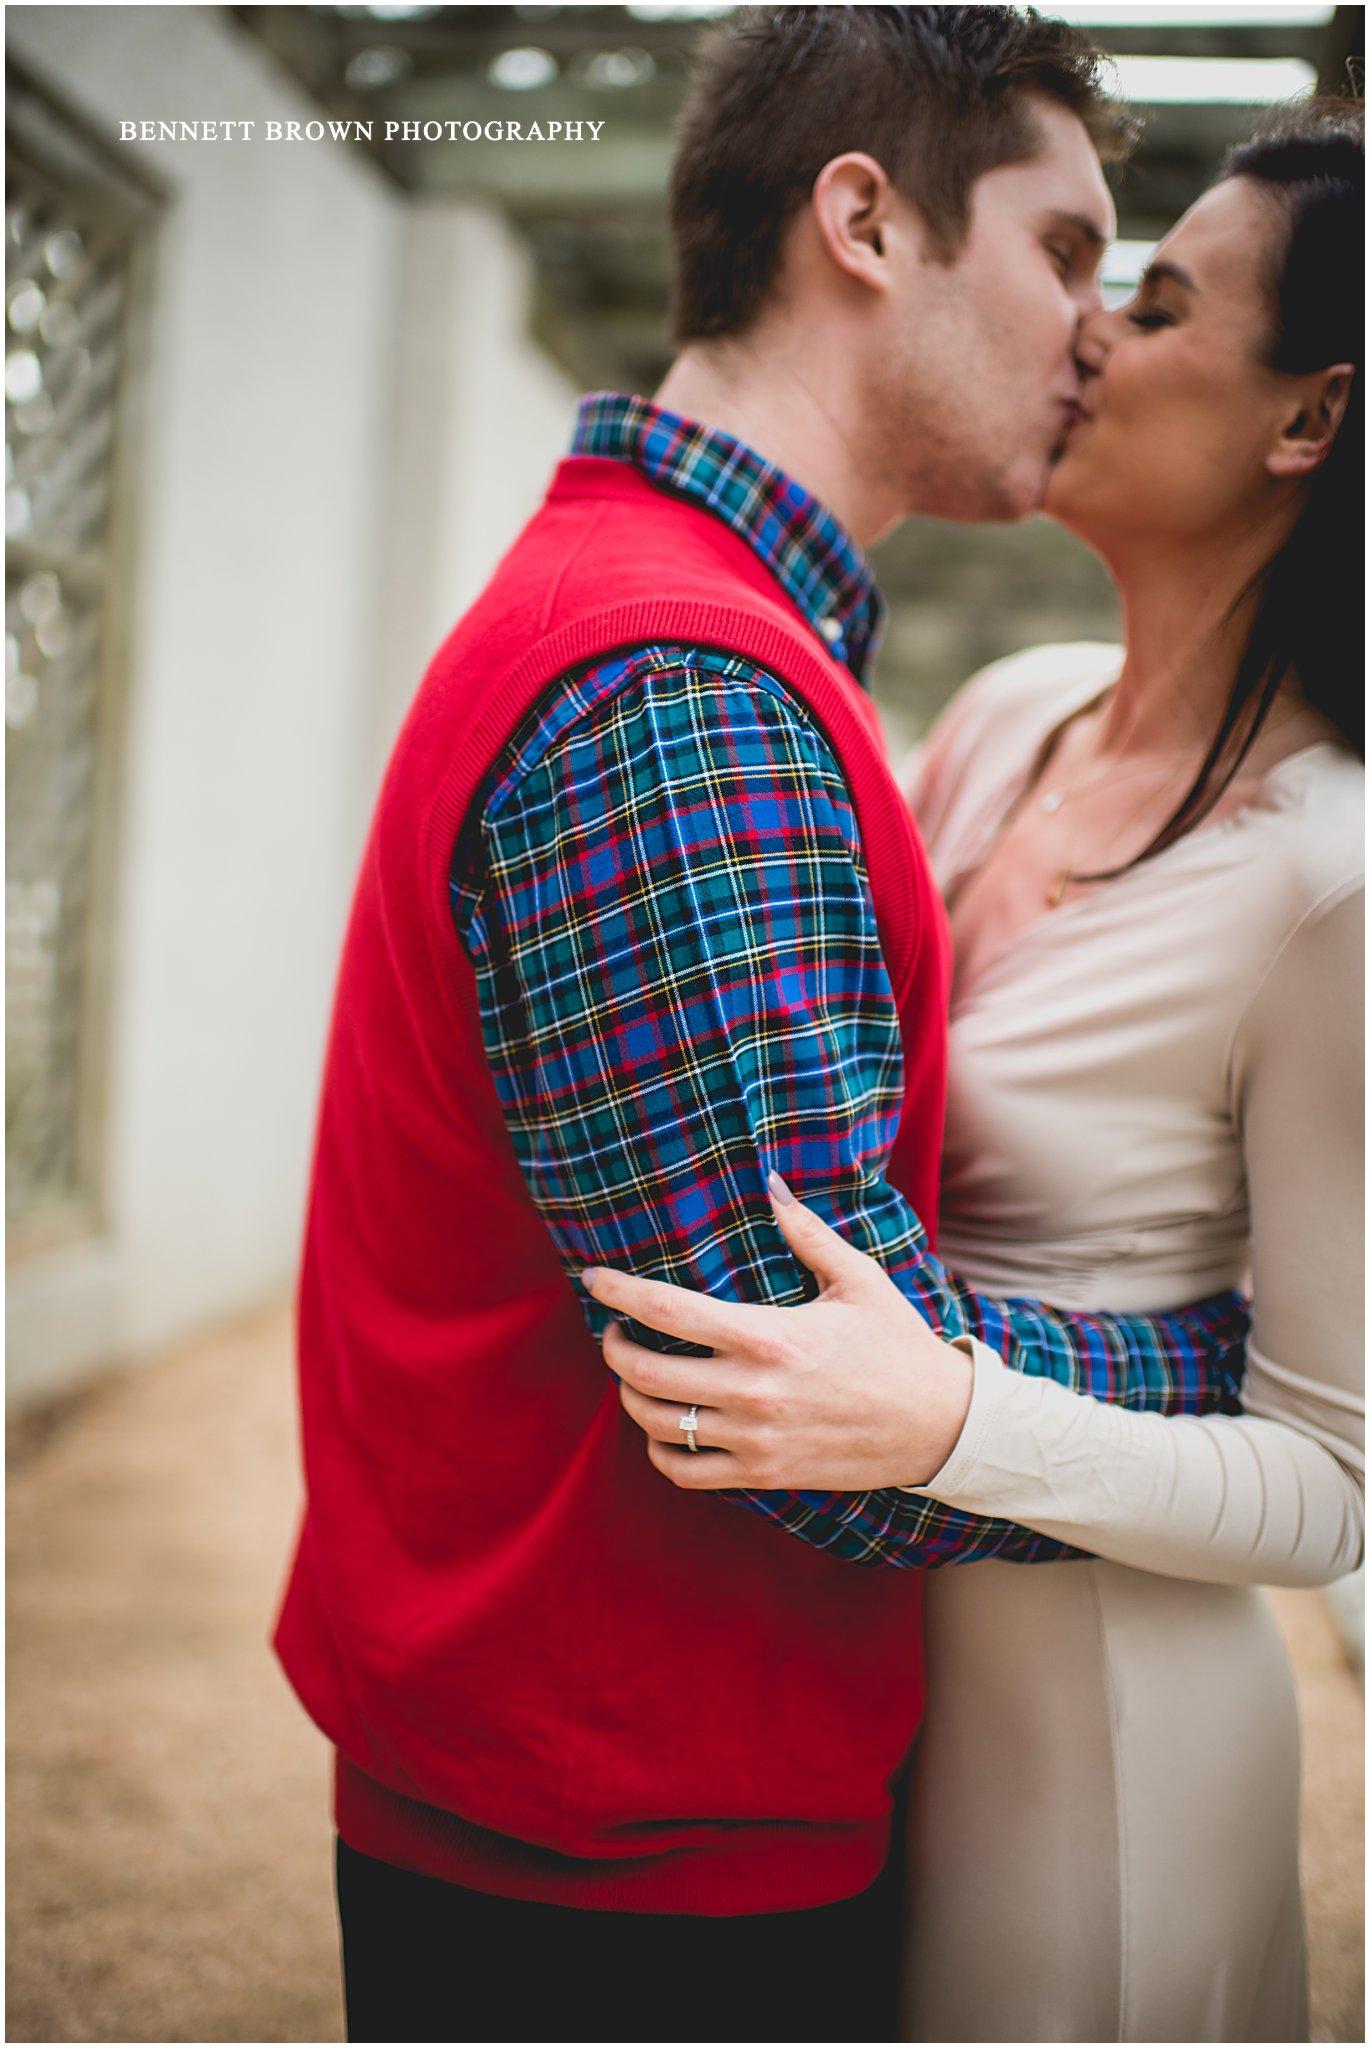 Bennett Brown Photography Detail shoot Wedding photographer Houston Texas Engagement  Kiss